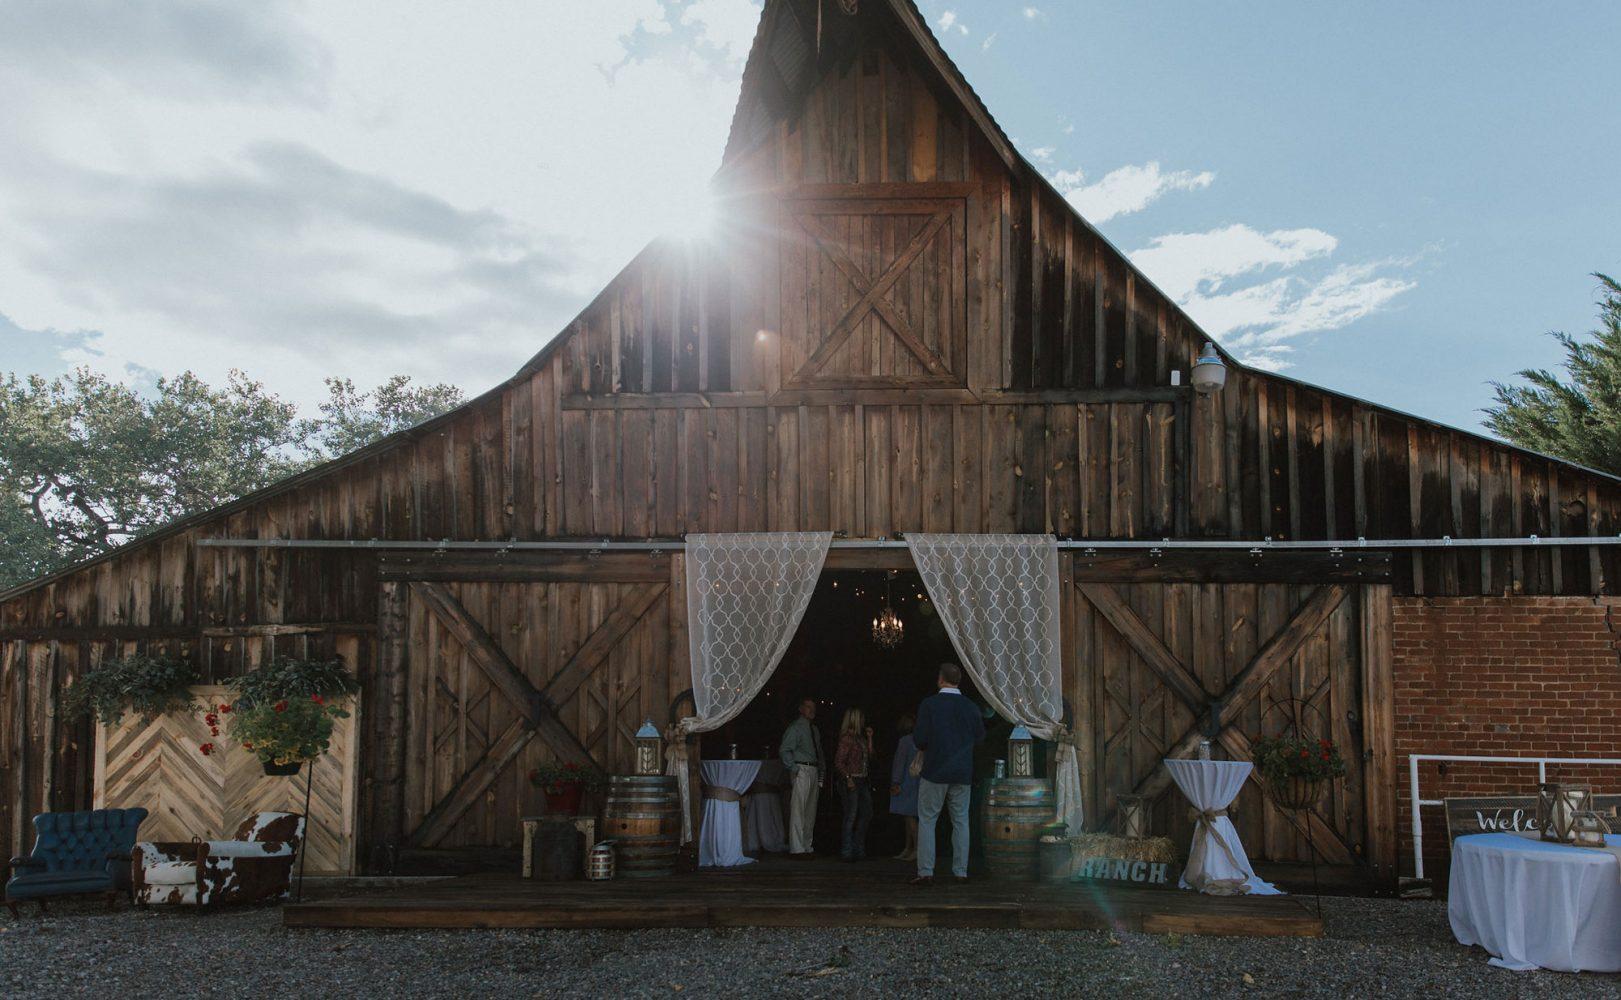 Triple J Ranch Barn Venue in Kirtland, New Mexico